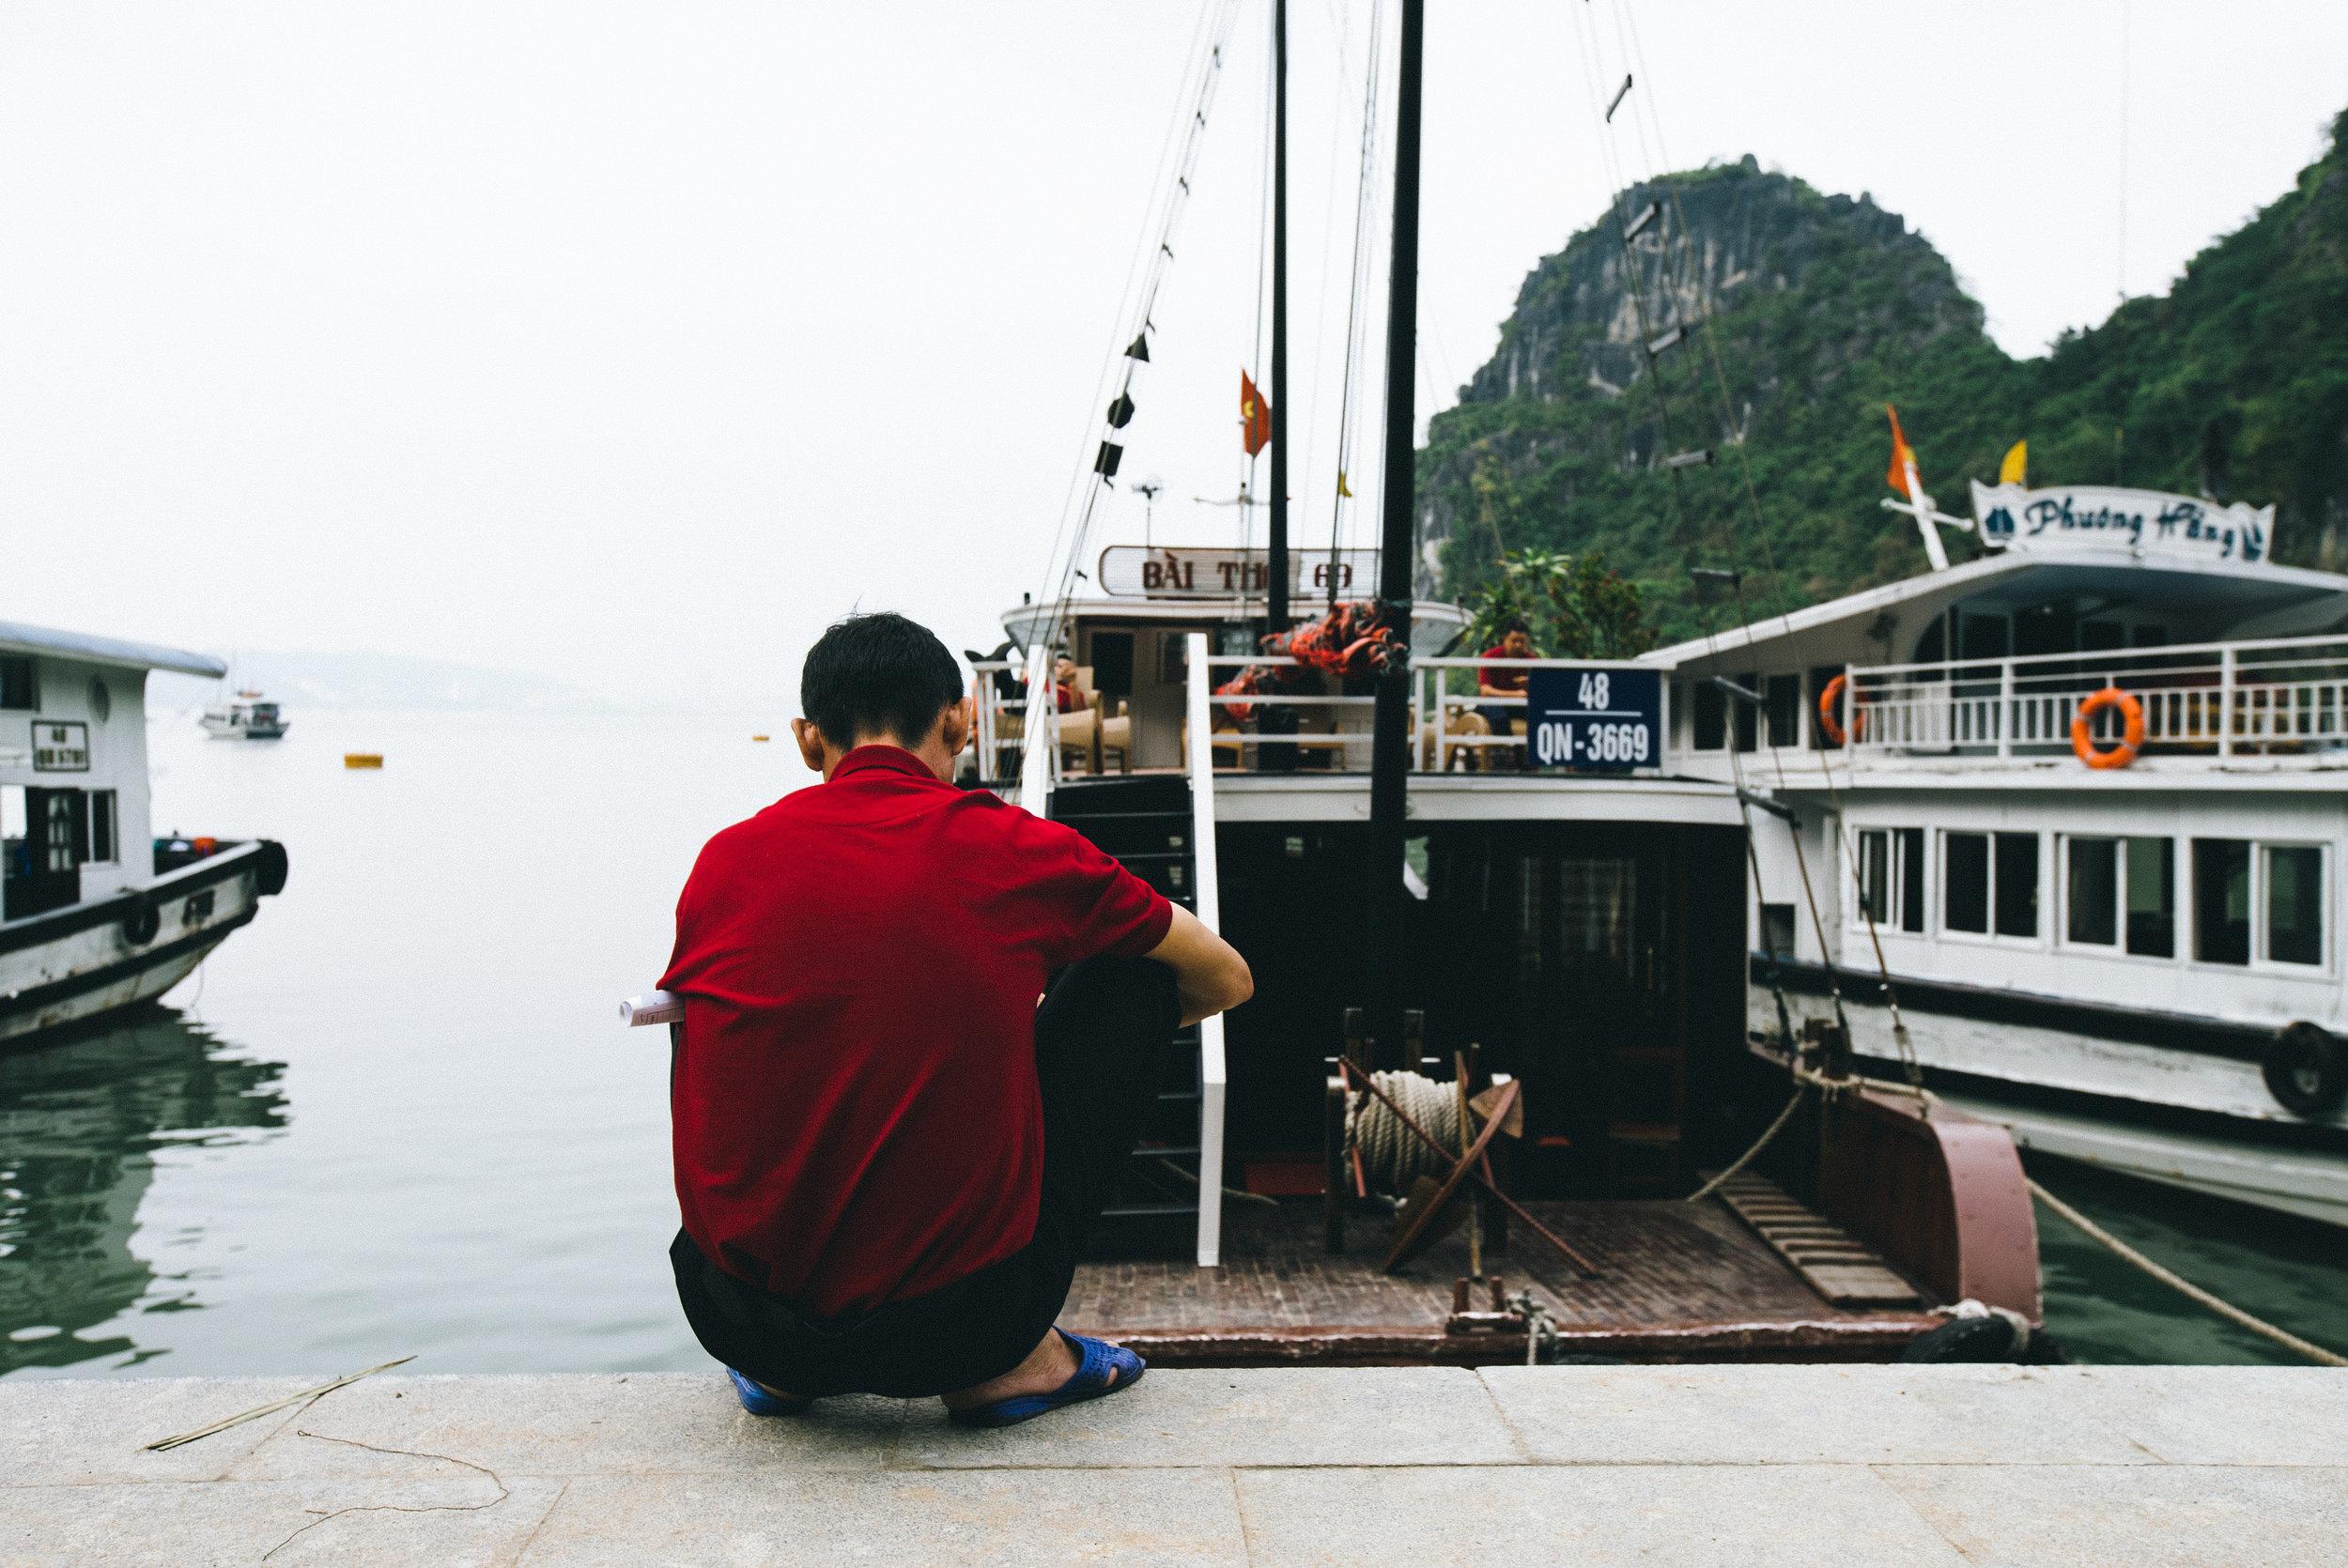 20170424_Vietnam_00073.jpg